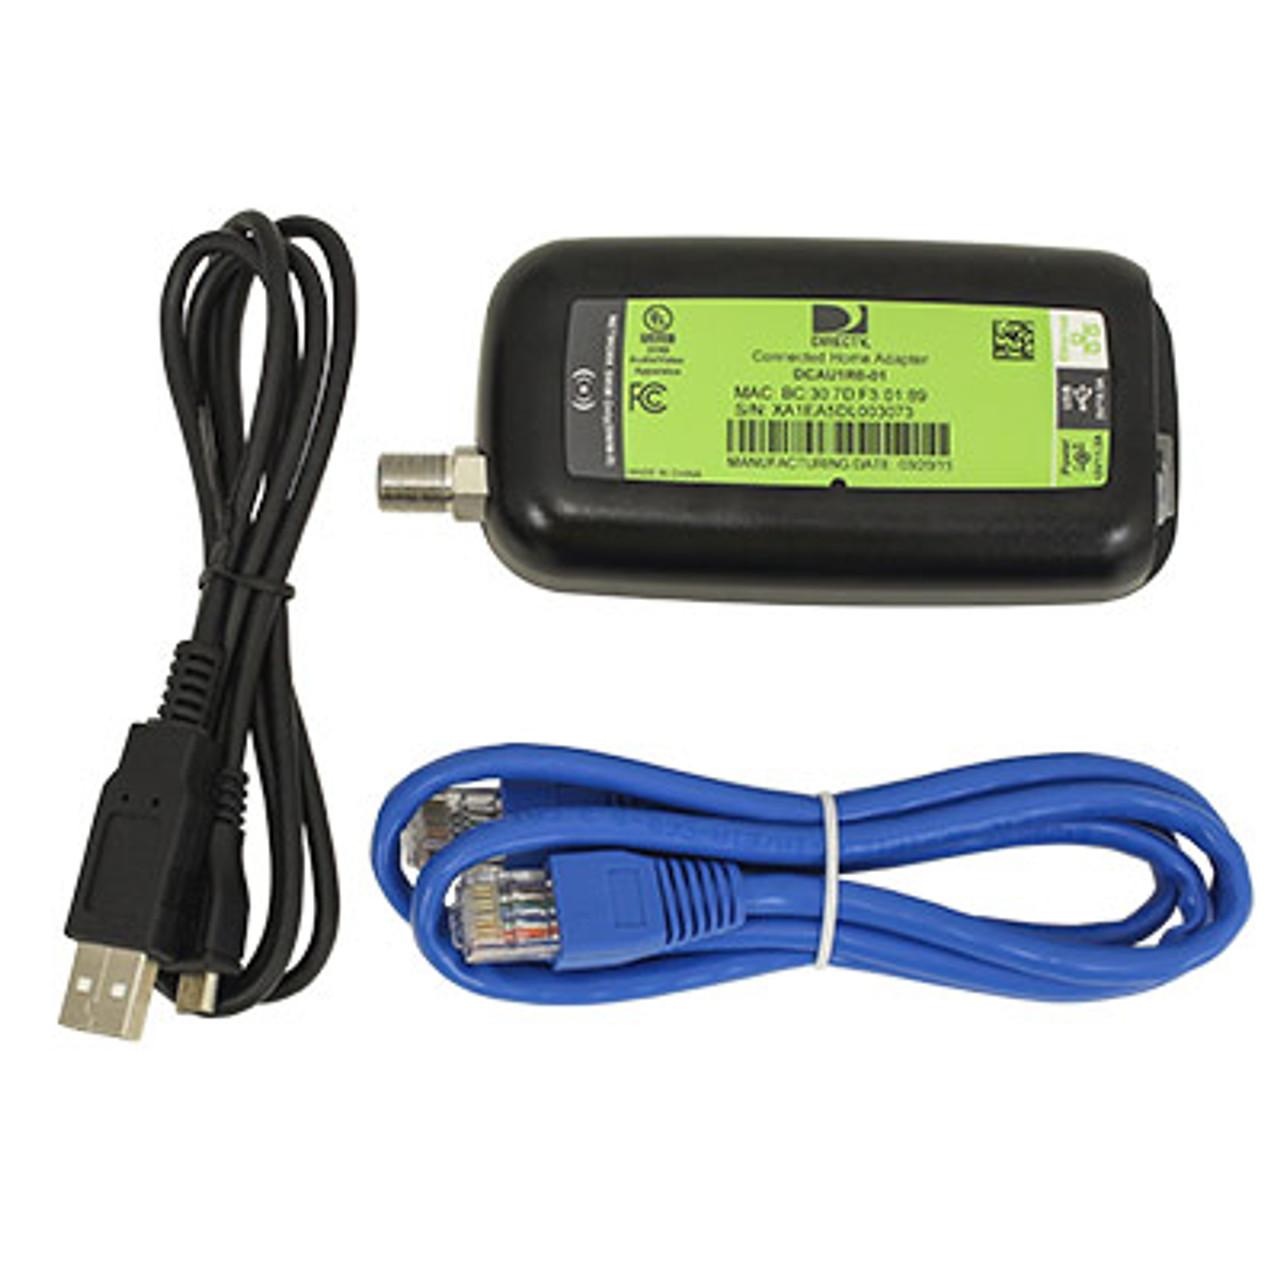 2 PACK ... Third Generation DIRECTV Broadband DECA Ethernet to Coax Adapter